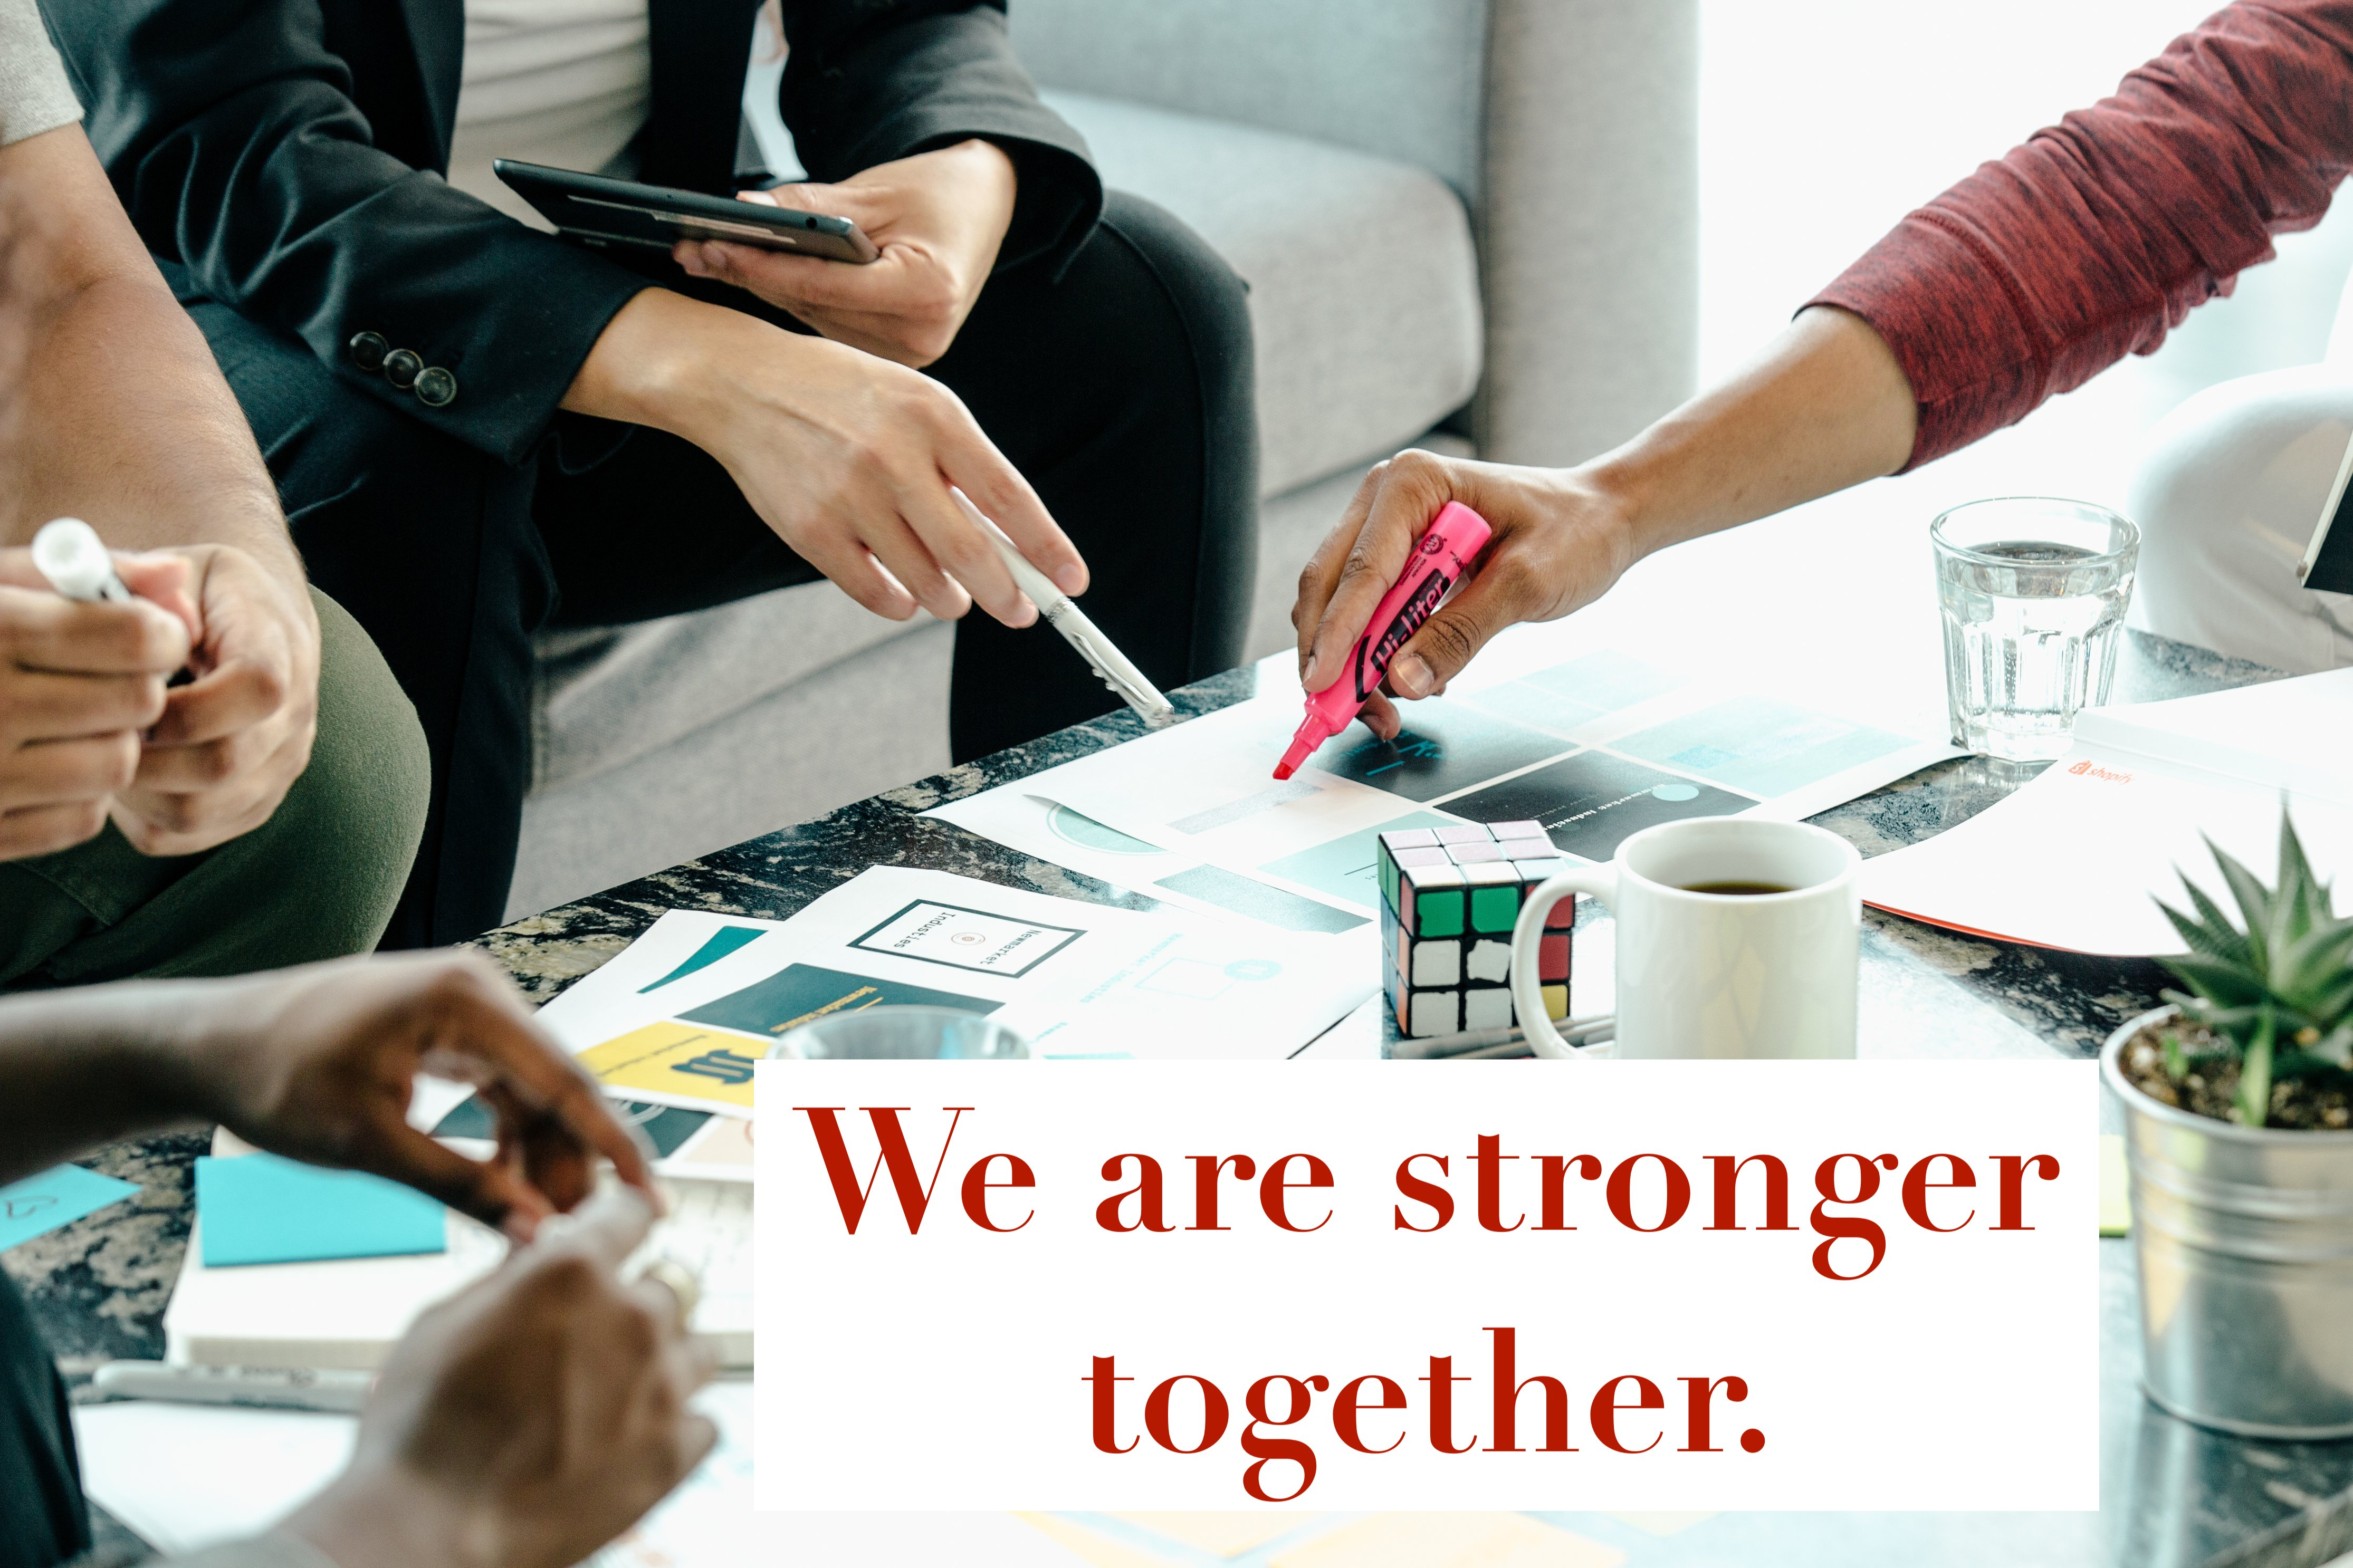 brainstorm-meeting-ideas_4460x4460